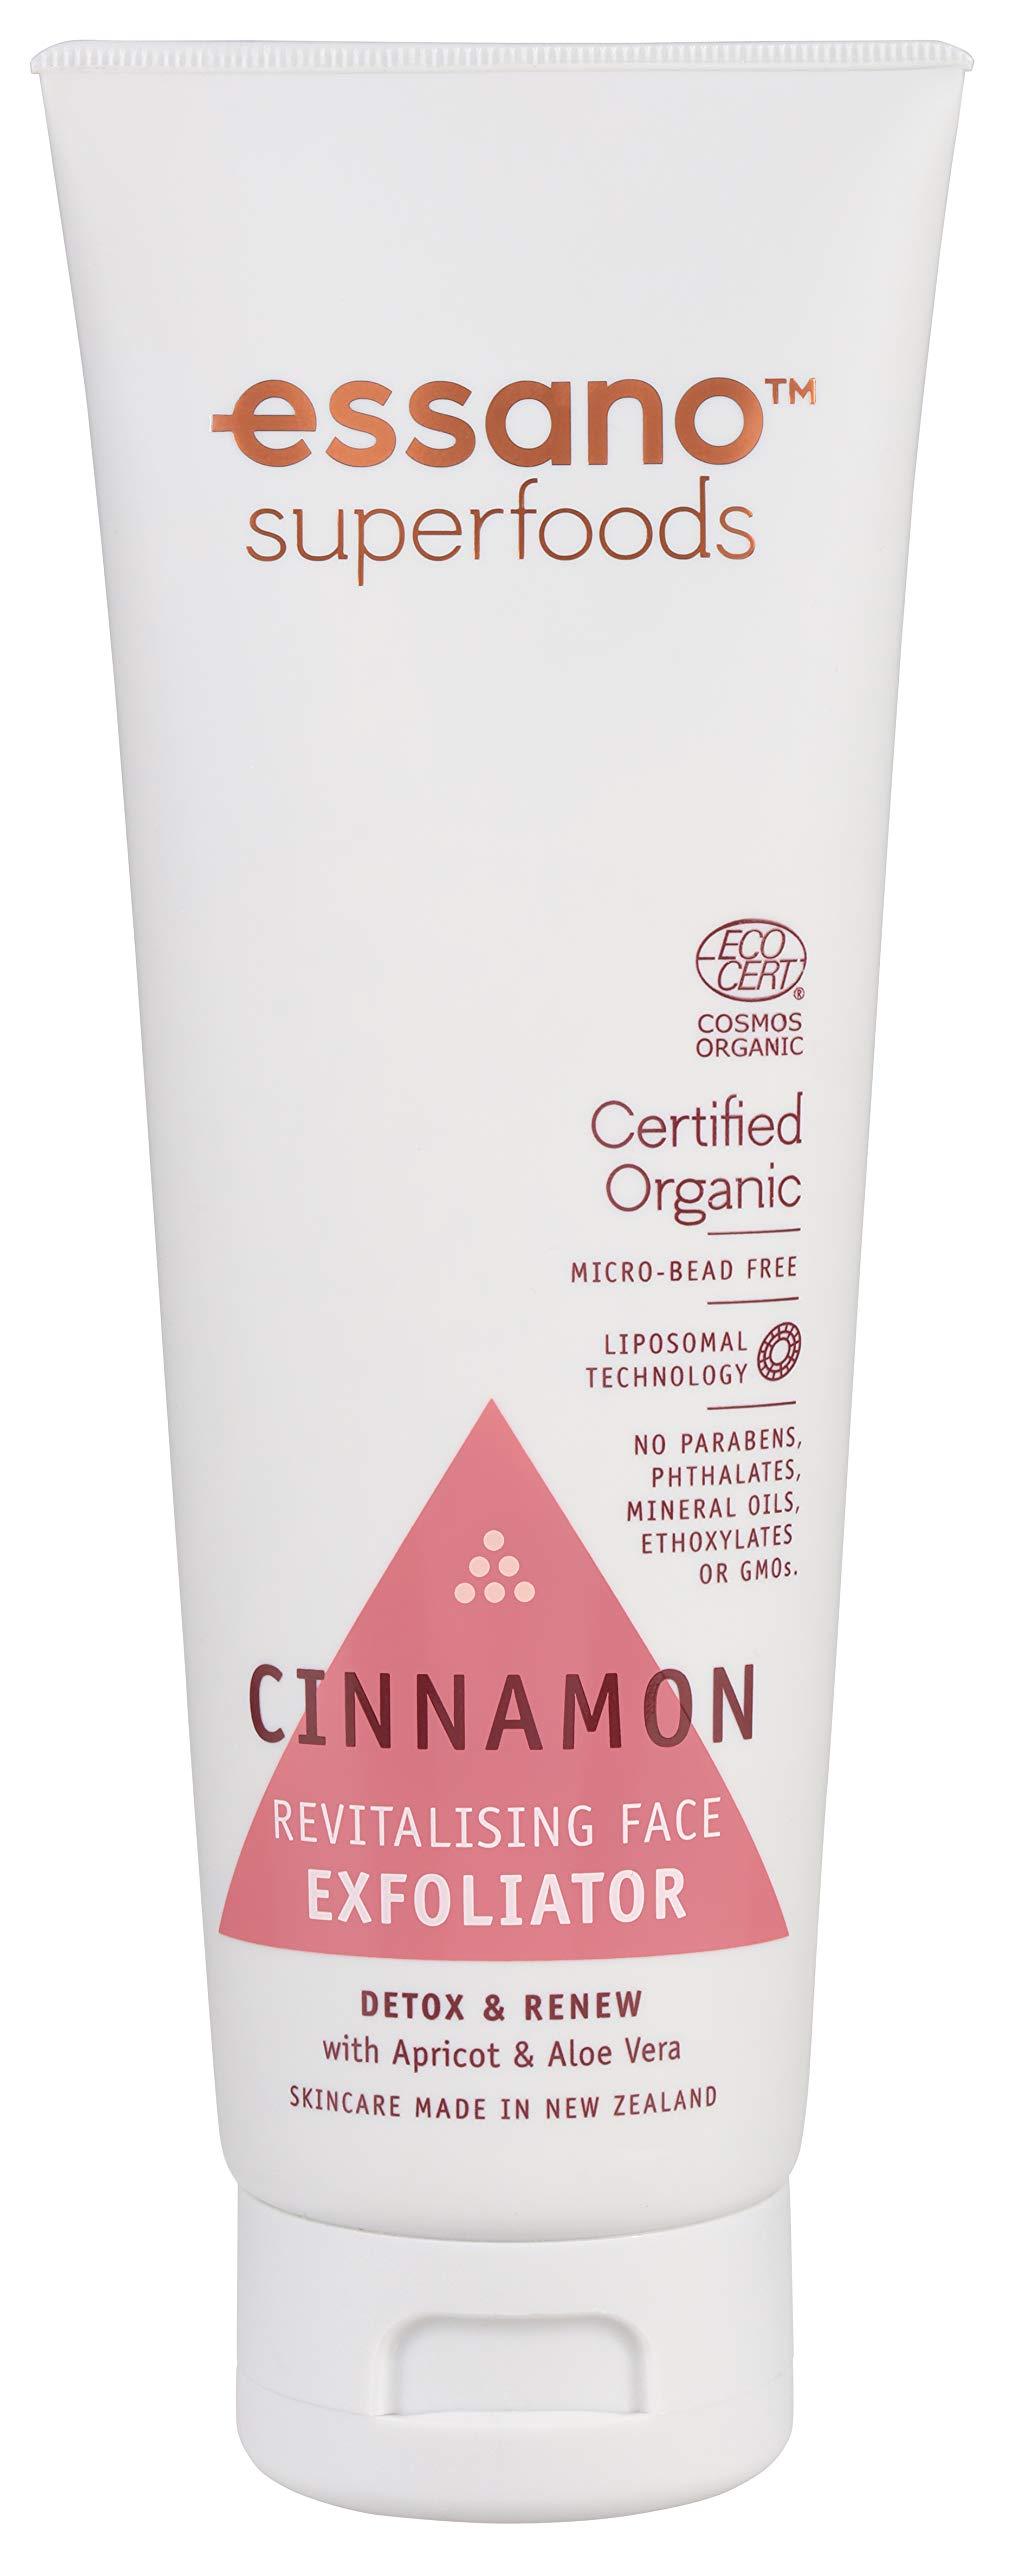 Essano Superfoods Certified Organic Cinnamon Revitalising Face Exfoliator, 100ml